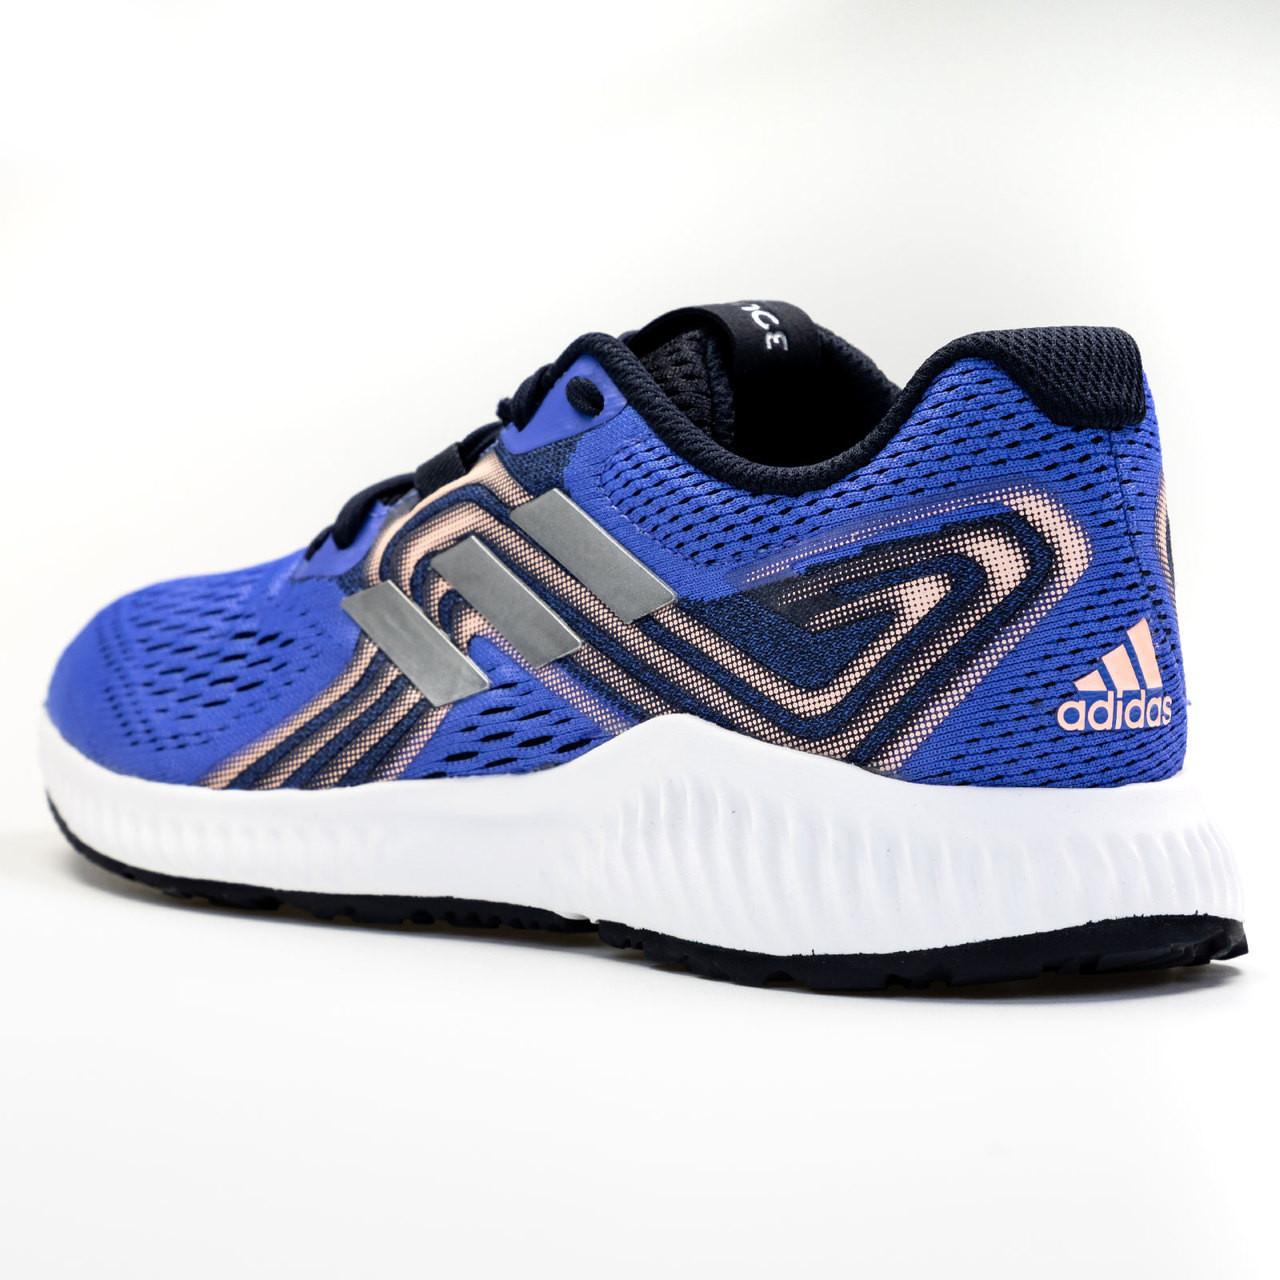 info for 91c14 95c54 ... Adidas Aerobounce Womens Sneakers AQ0540 - Lilac, Silver ...